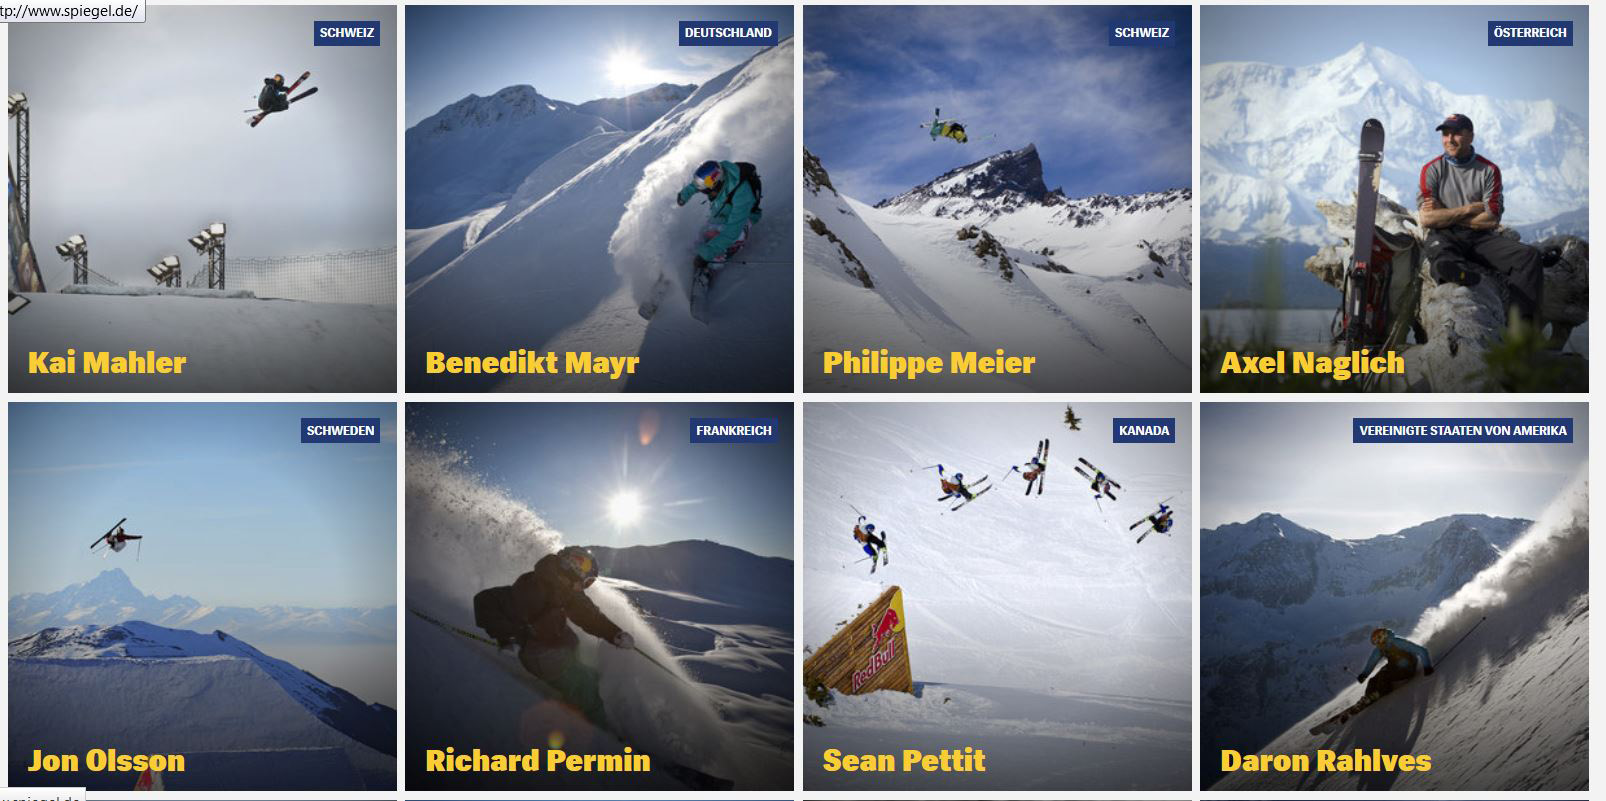 Screenshot Redbull.com Athletensuche